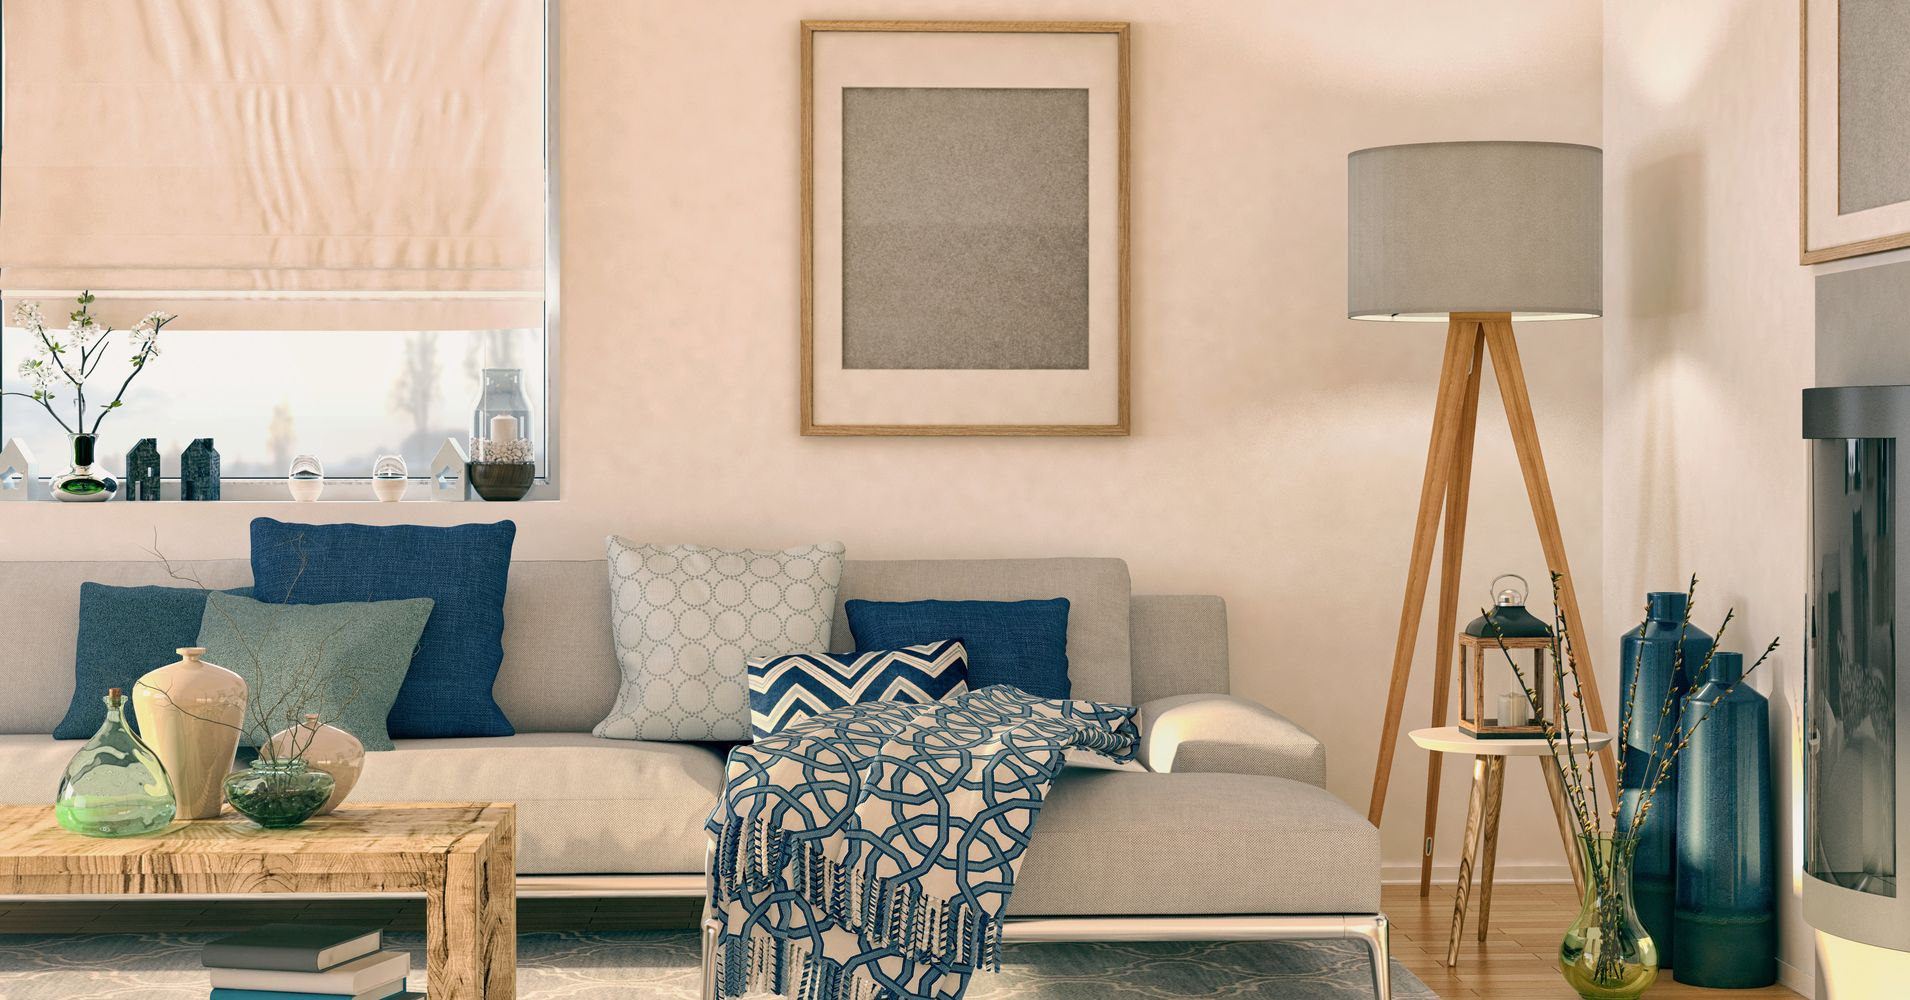 The best stores to buy scandinavian furniture online huffpost life - Best online furniture stores ...